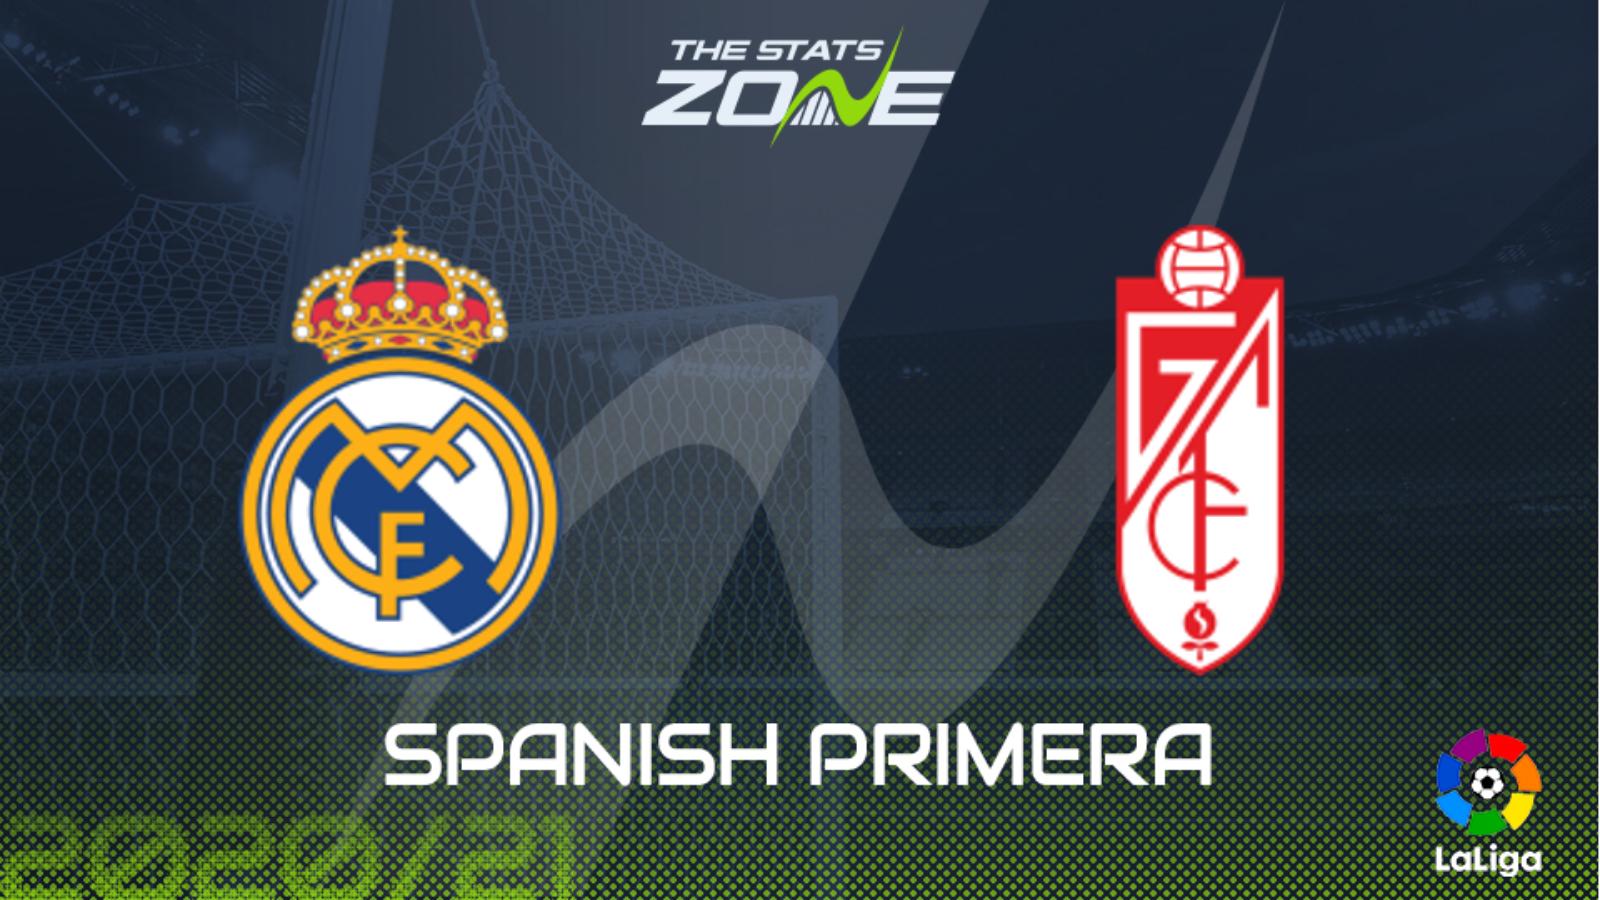 Granada vs real madrid betting preview karrakatta plate betting advice